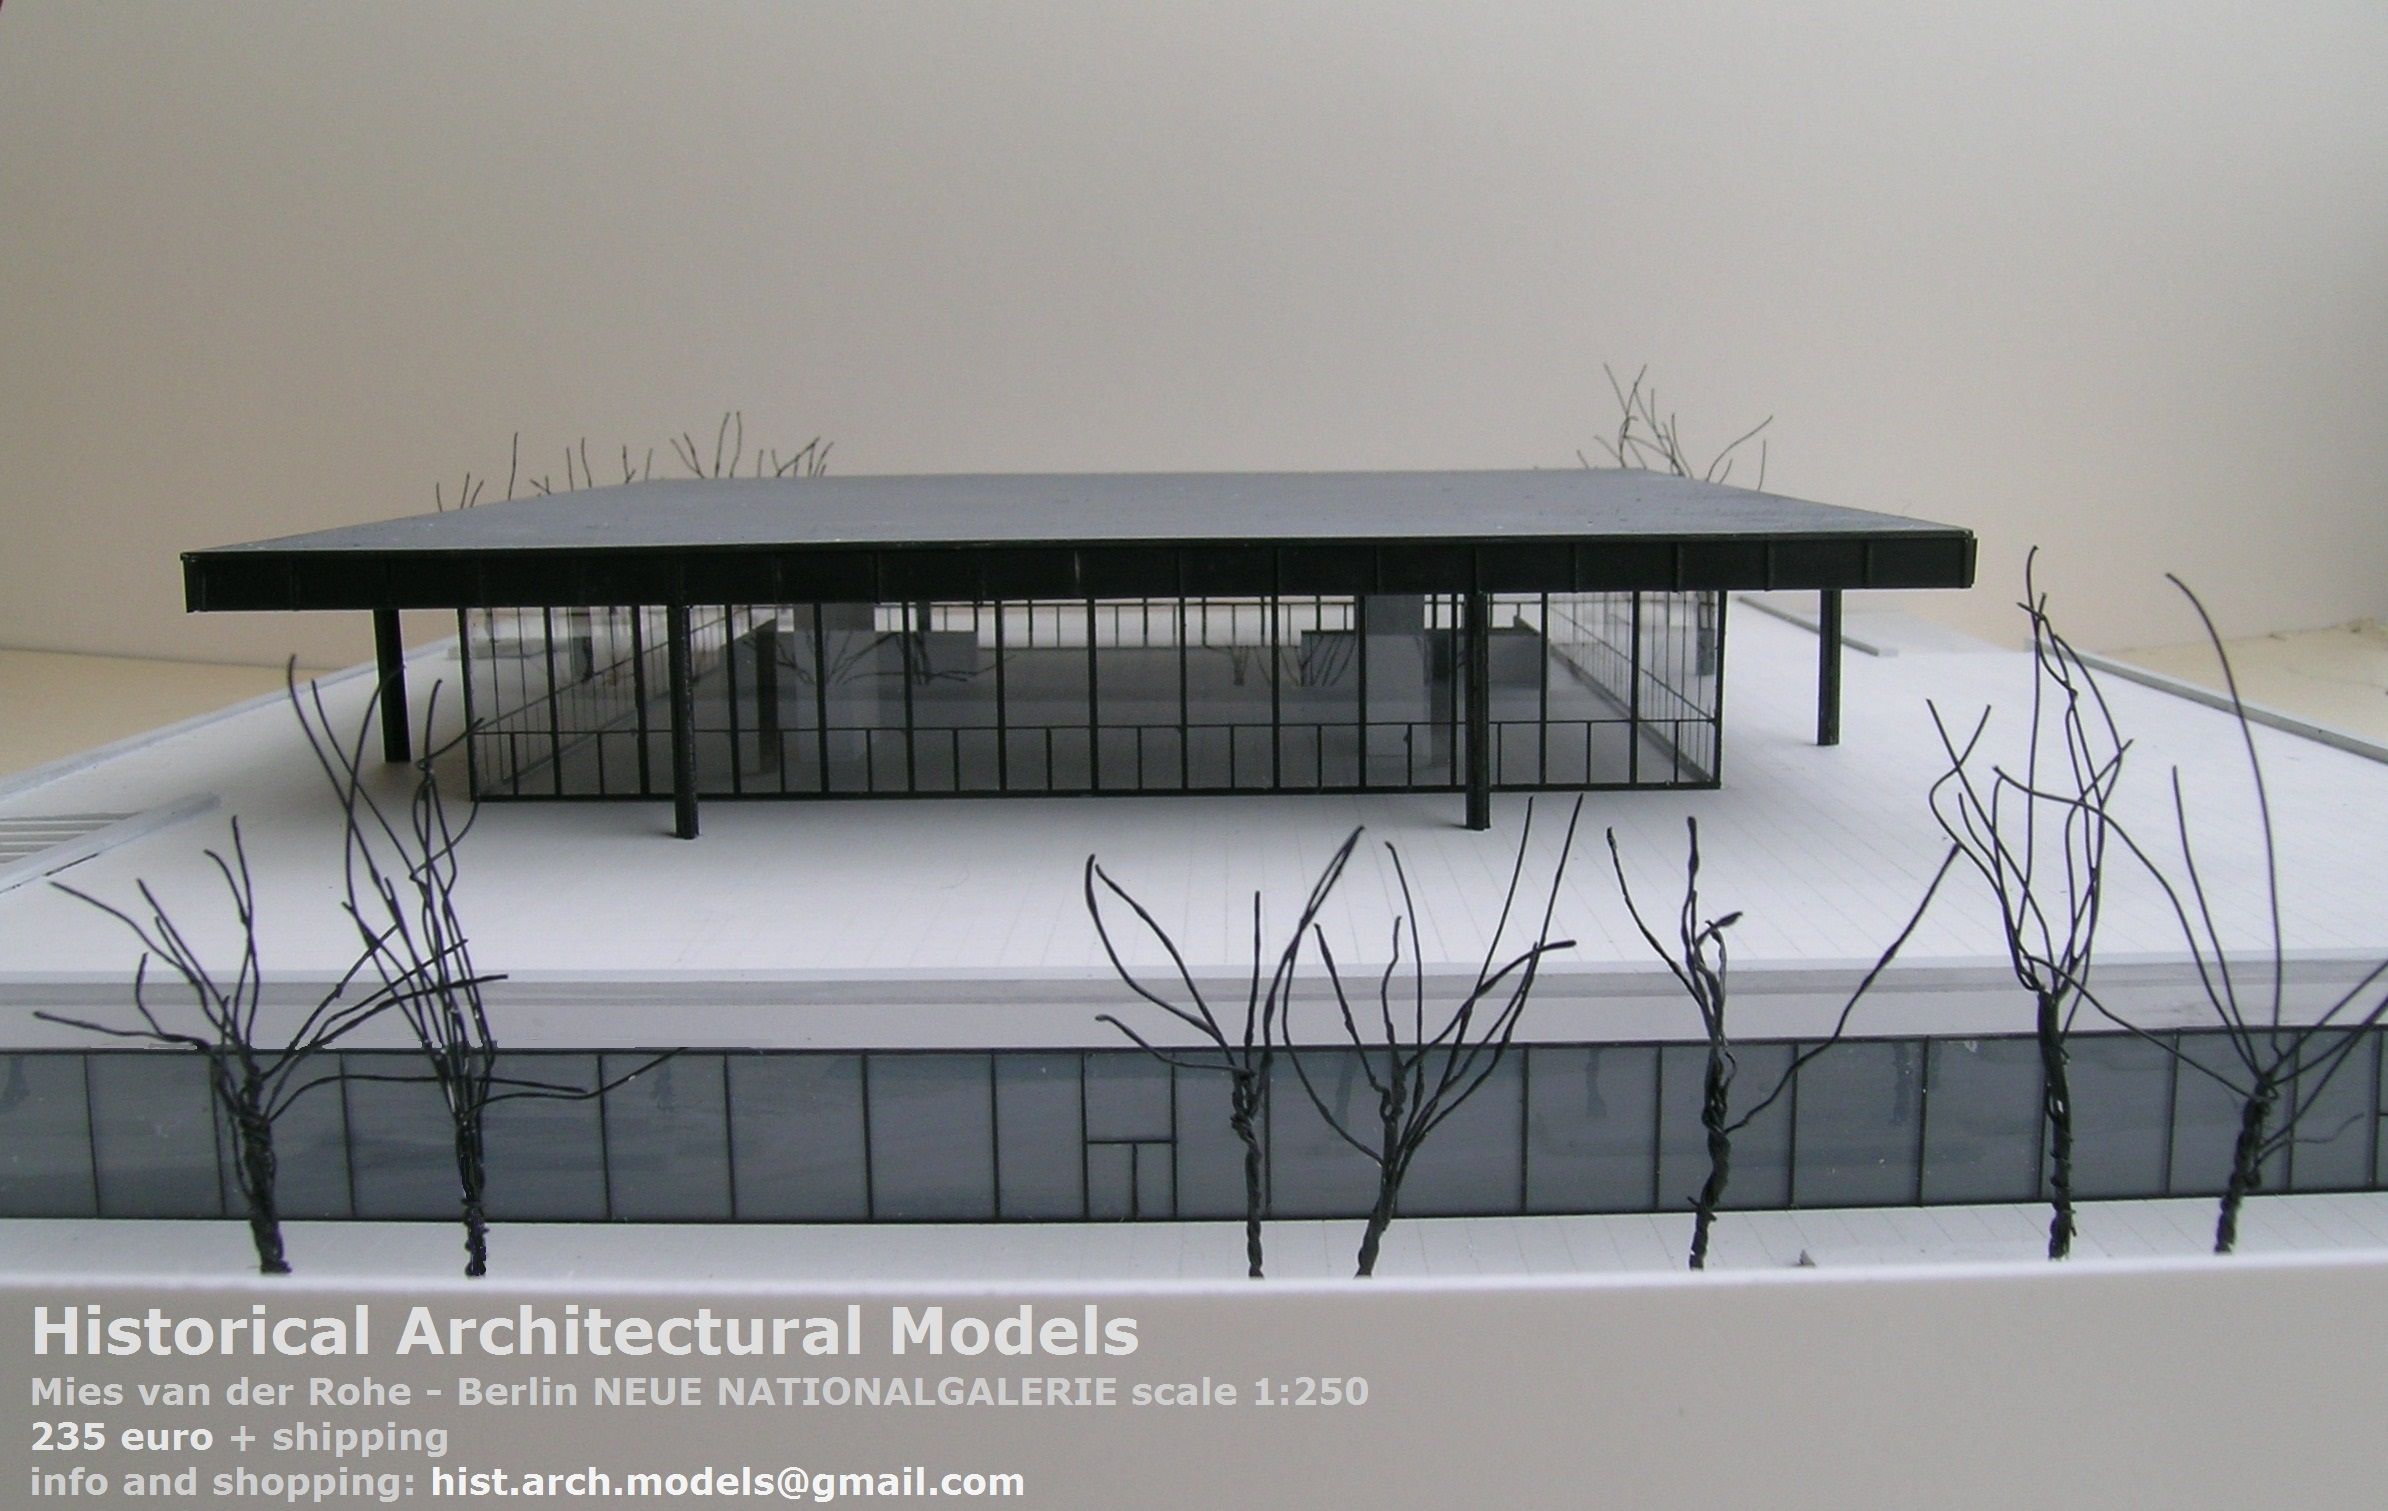 Plexiglas Berlin neue nationalgalerie by mies de rohe scale 1 250 size cm 54 5 x